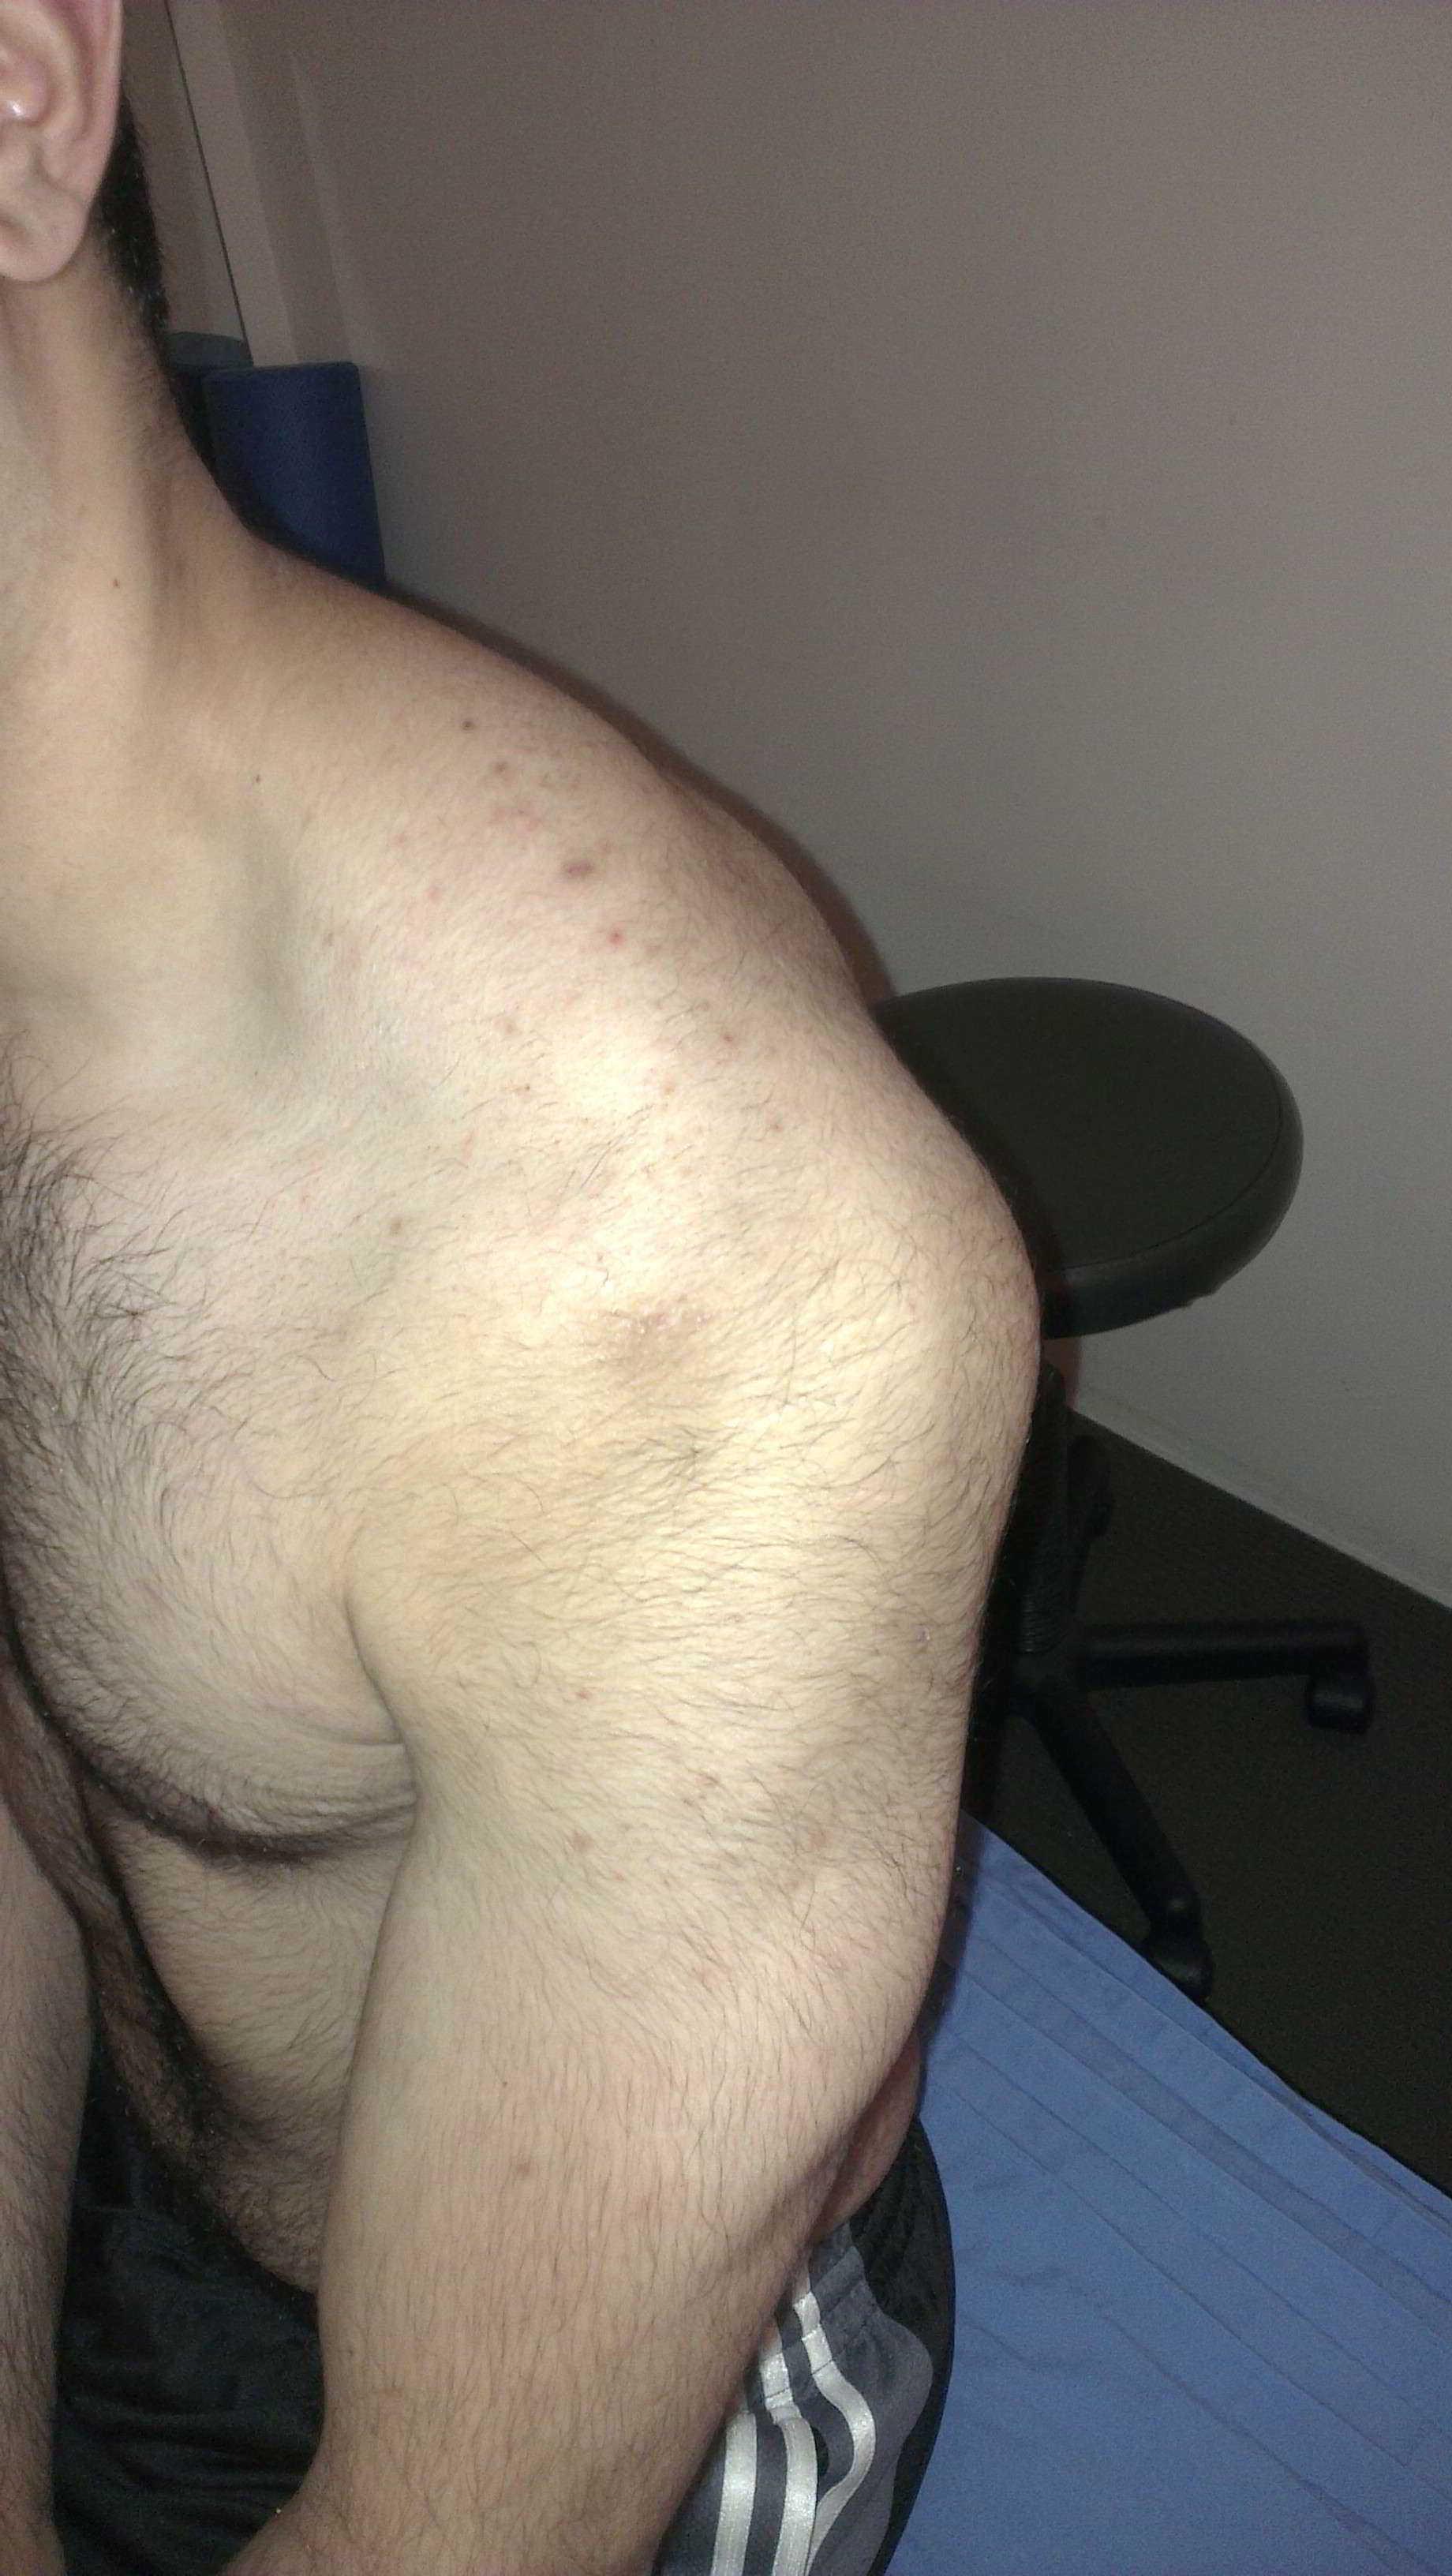 Set Shoulder Dislocation Posterior Shoulder Dislocation